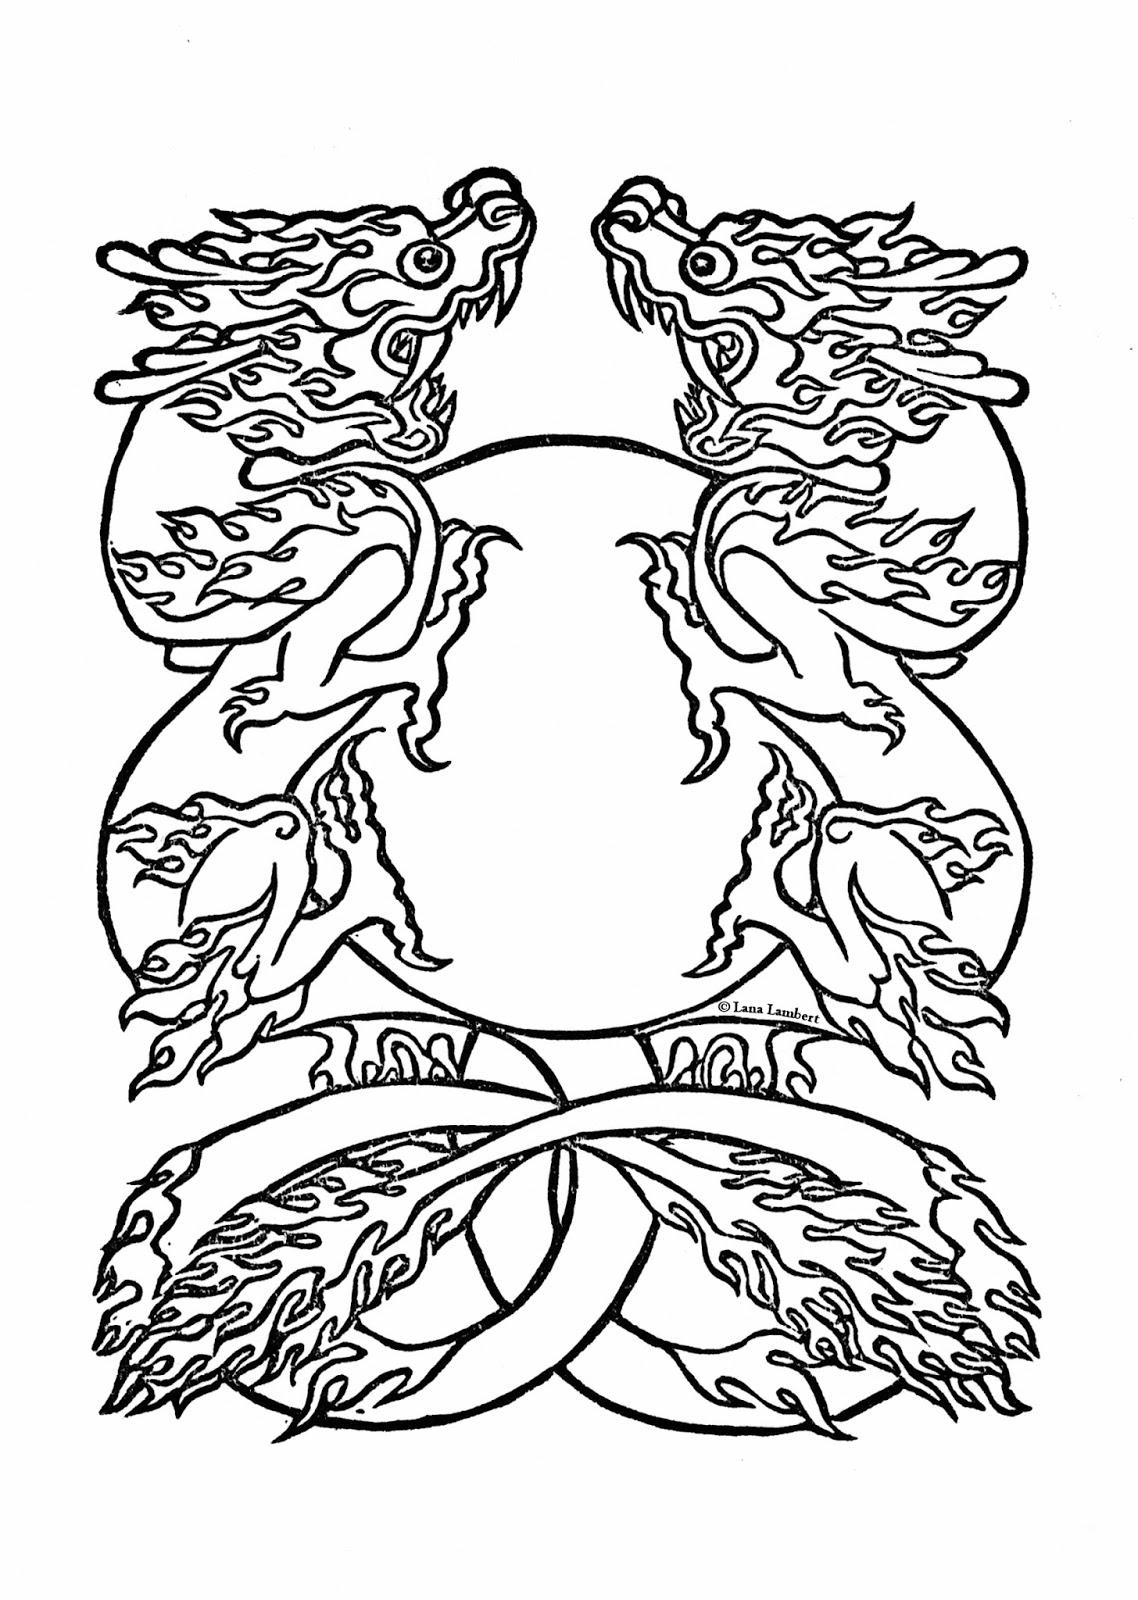 lambert press free coloring book page